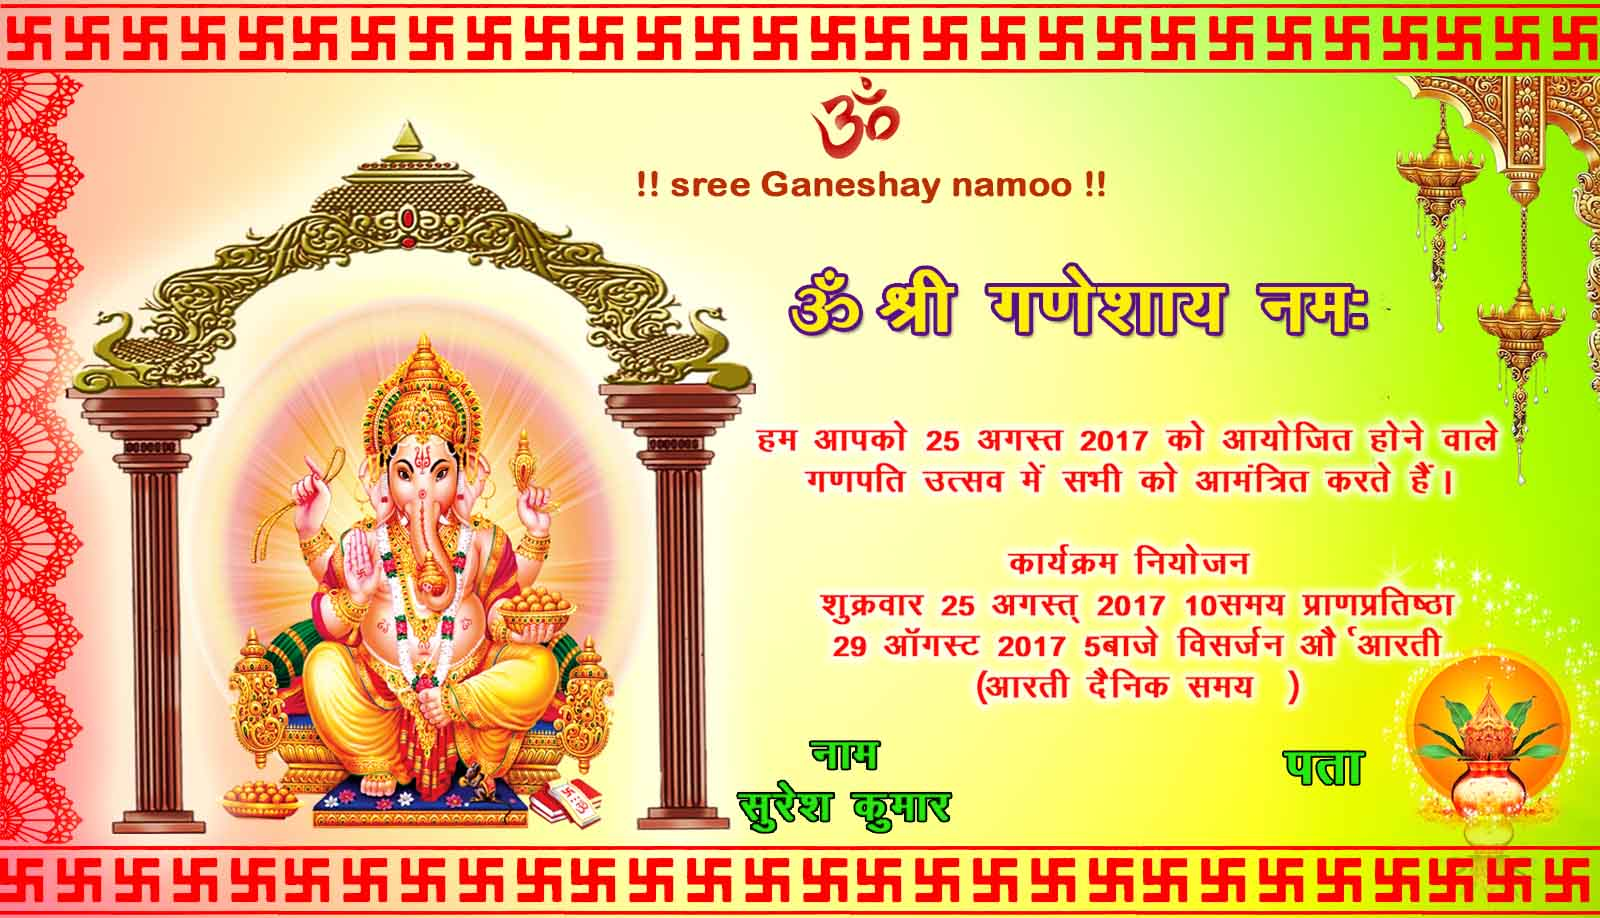 Ganesh Puja Invitation Card Picture Density